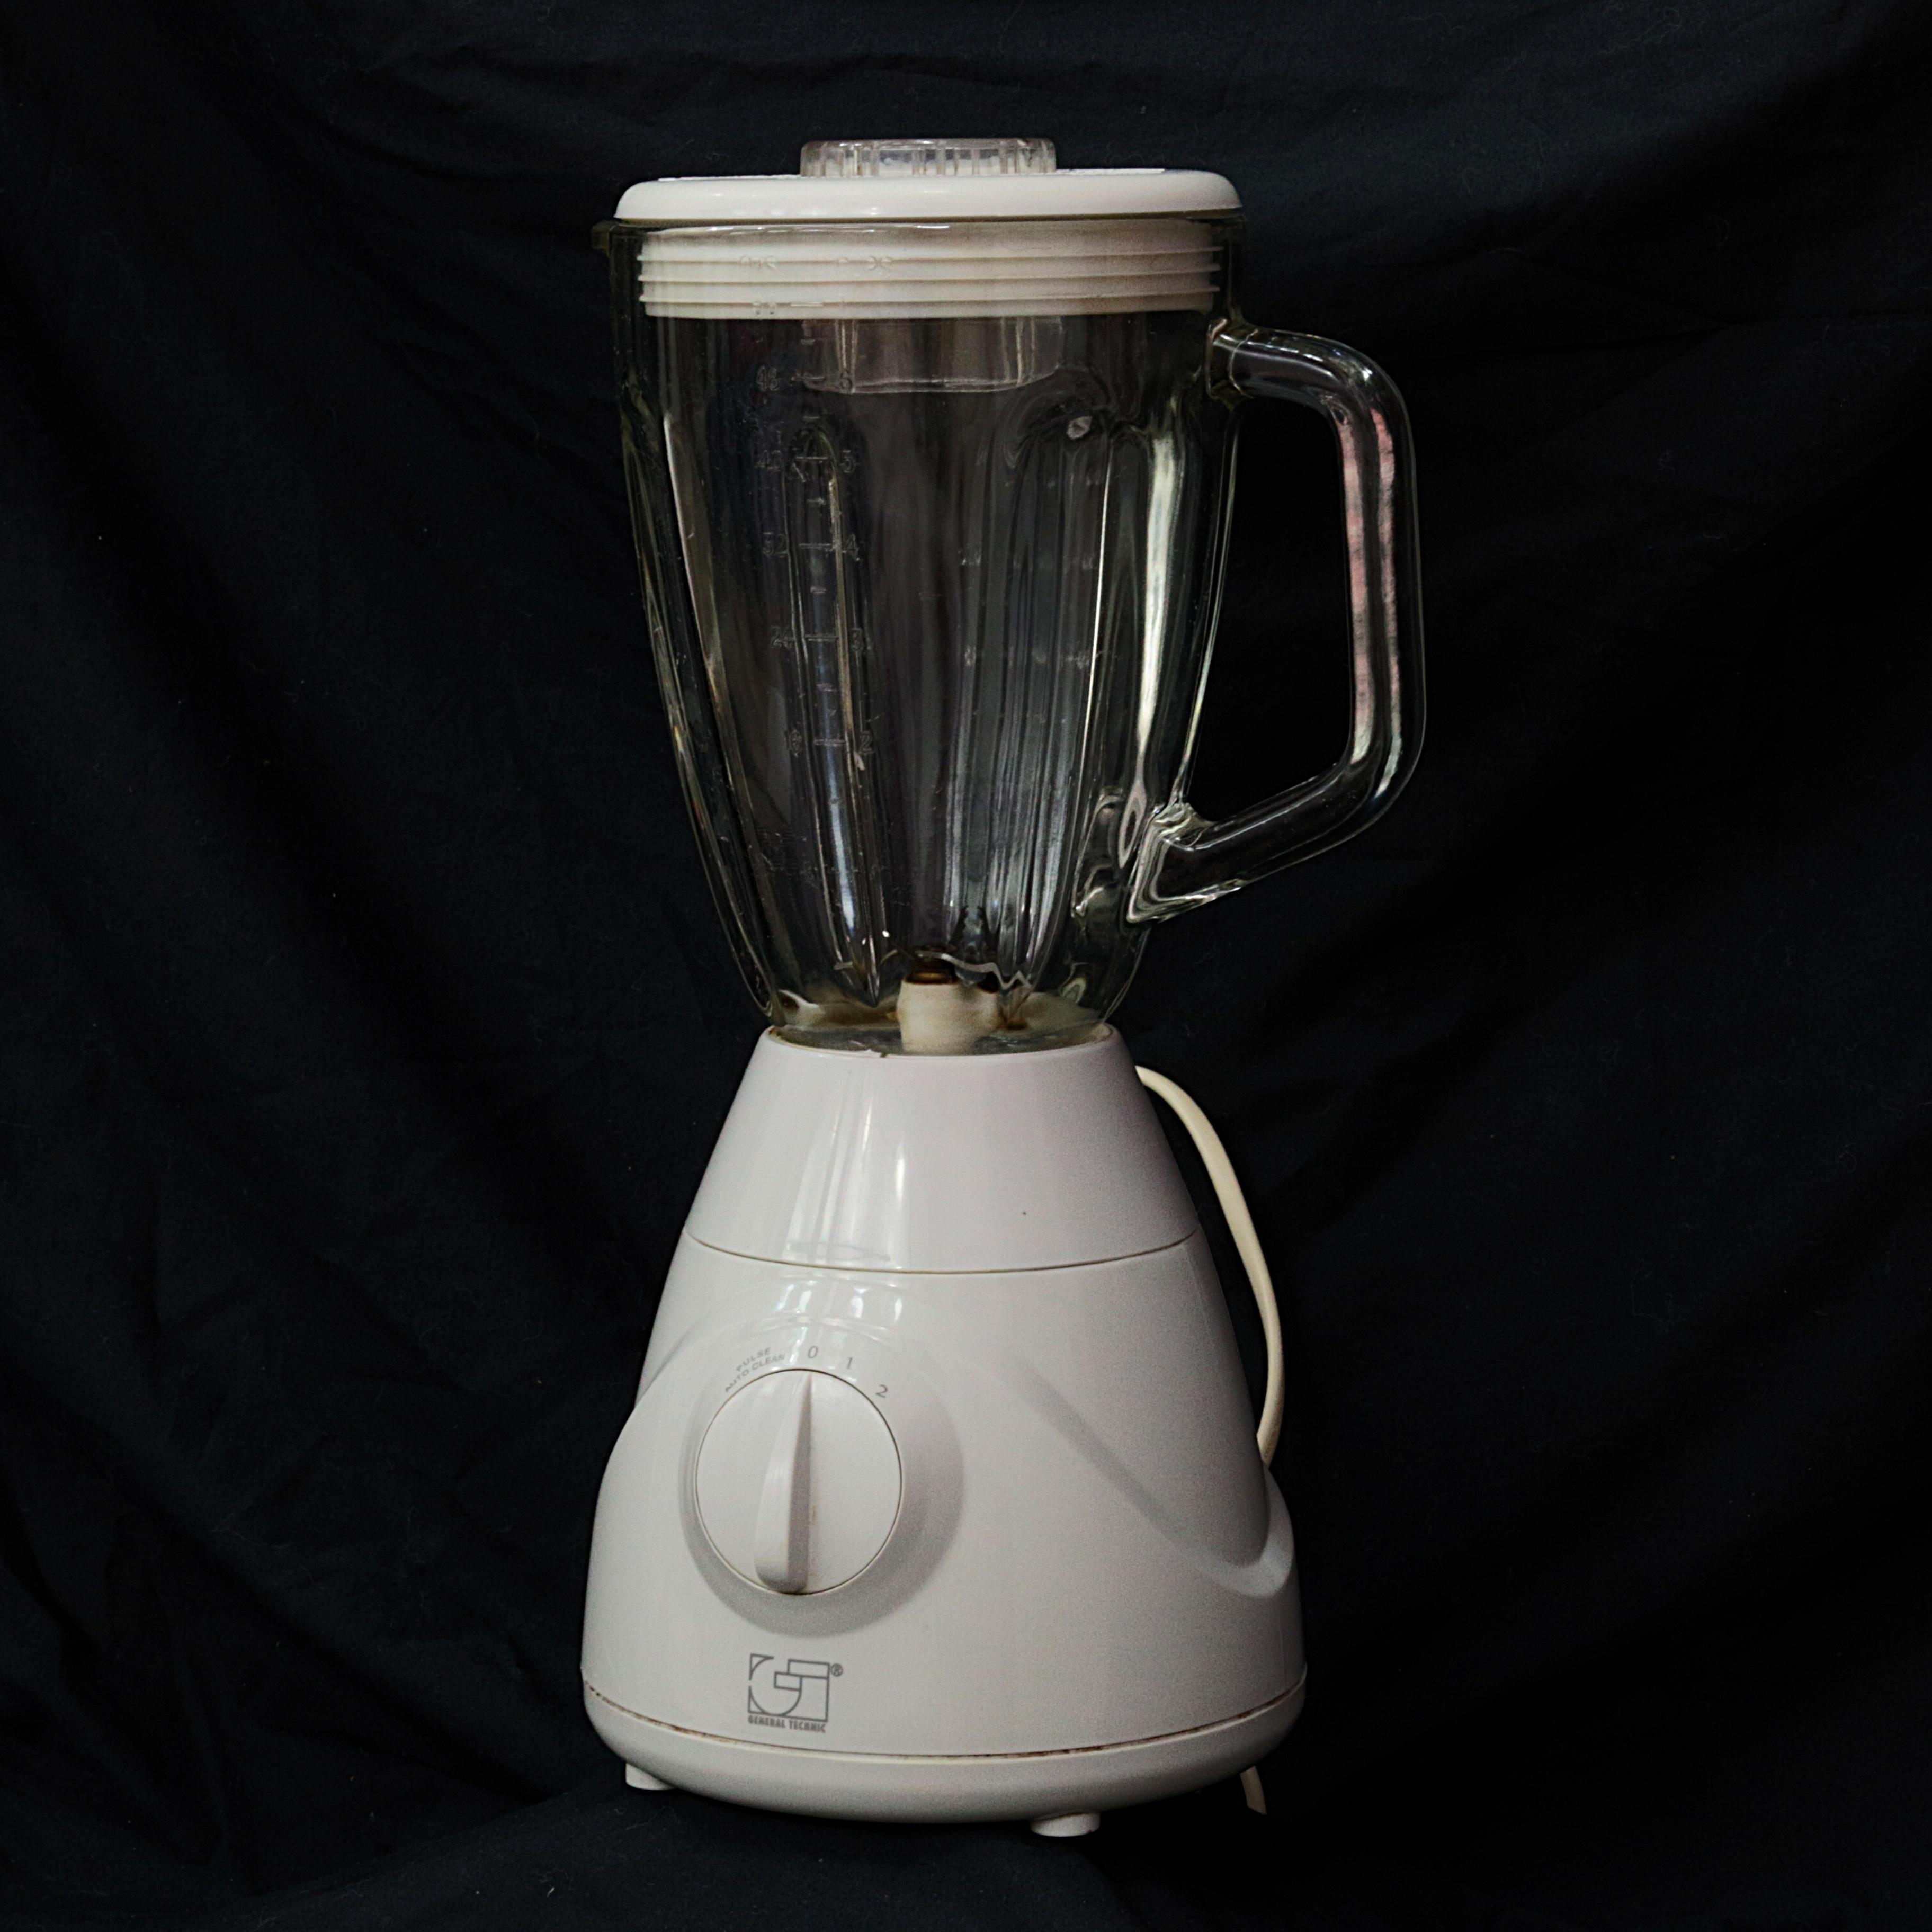 Free kitchen lighting device mixer robot blender